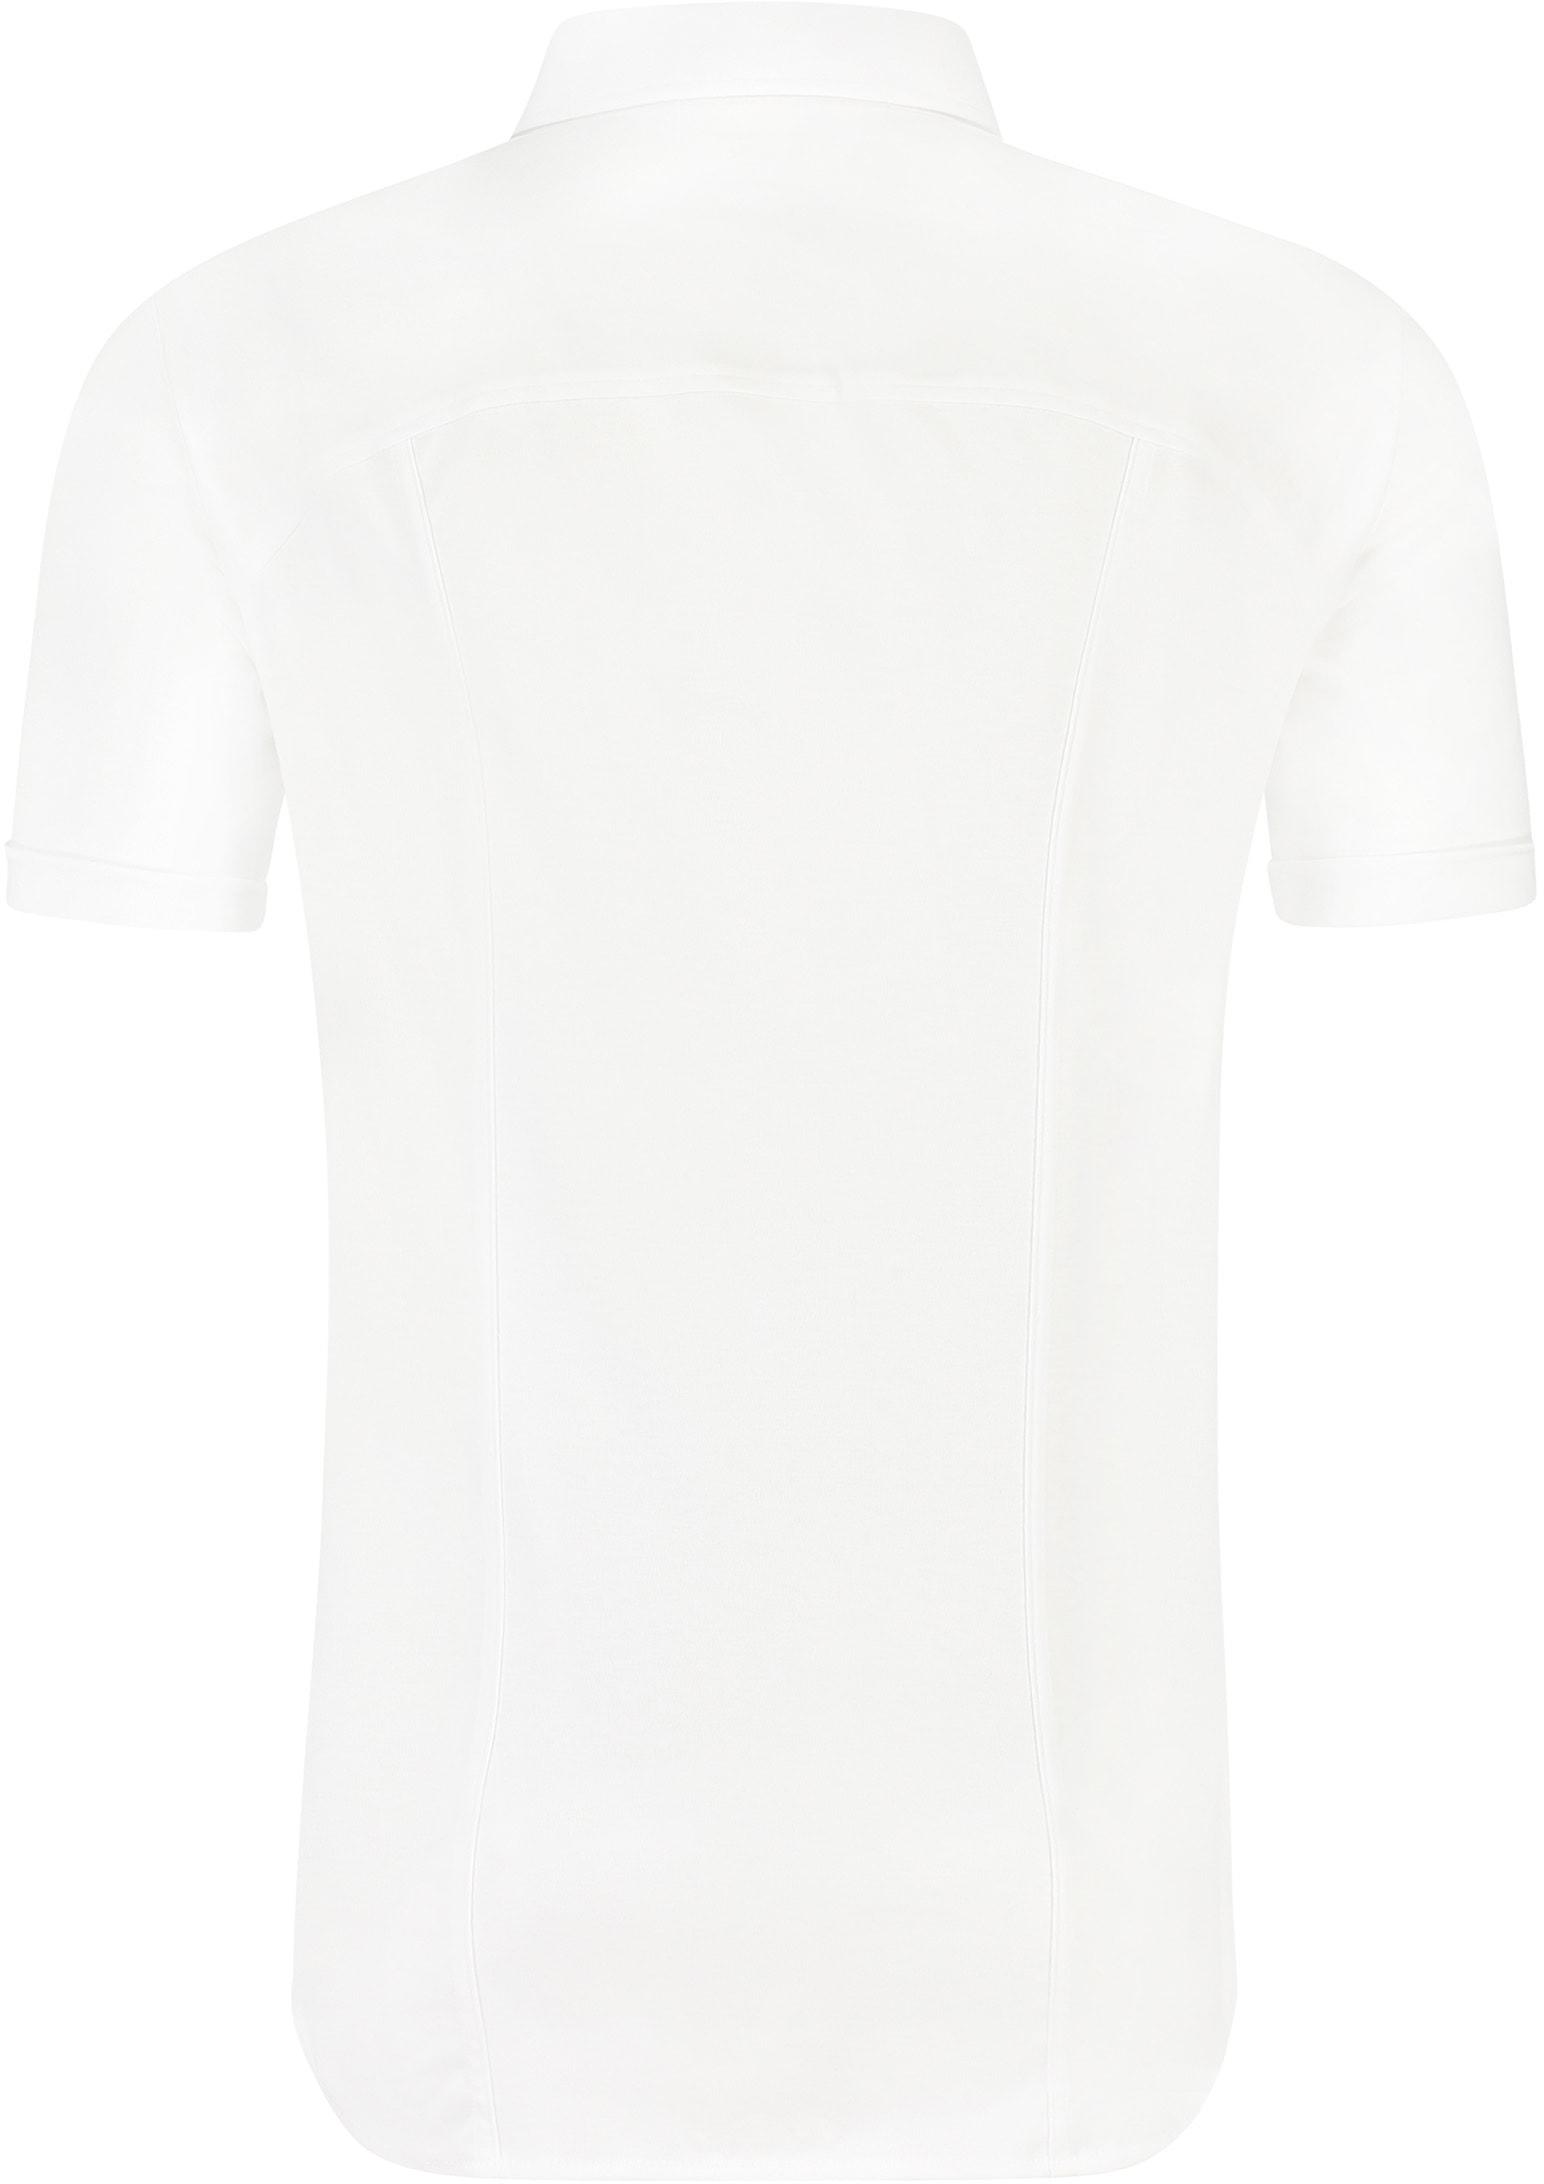 Desoto Overhemd Korte Mouw Wit foto 1